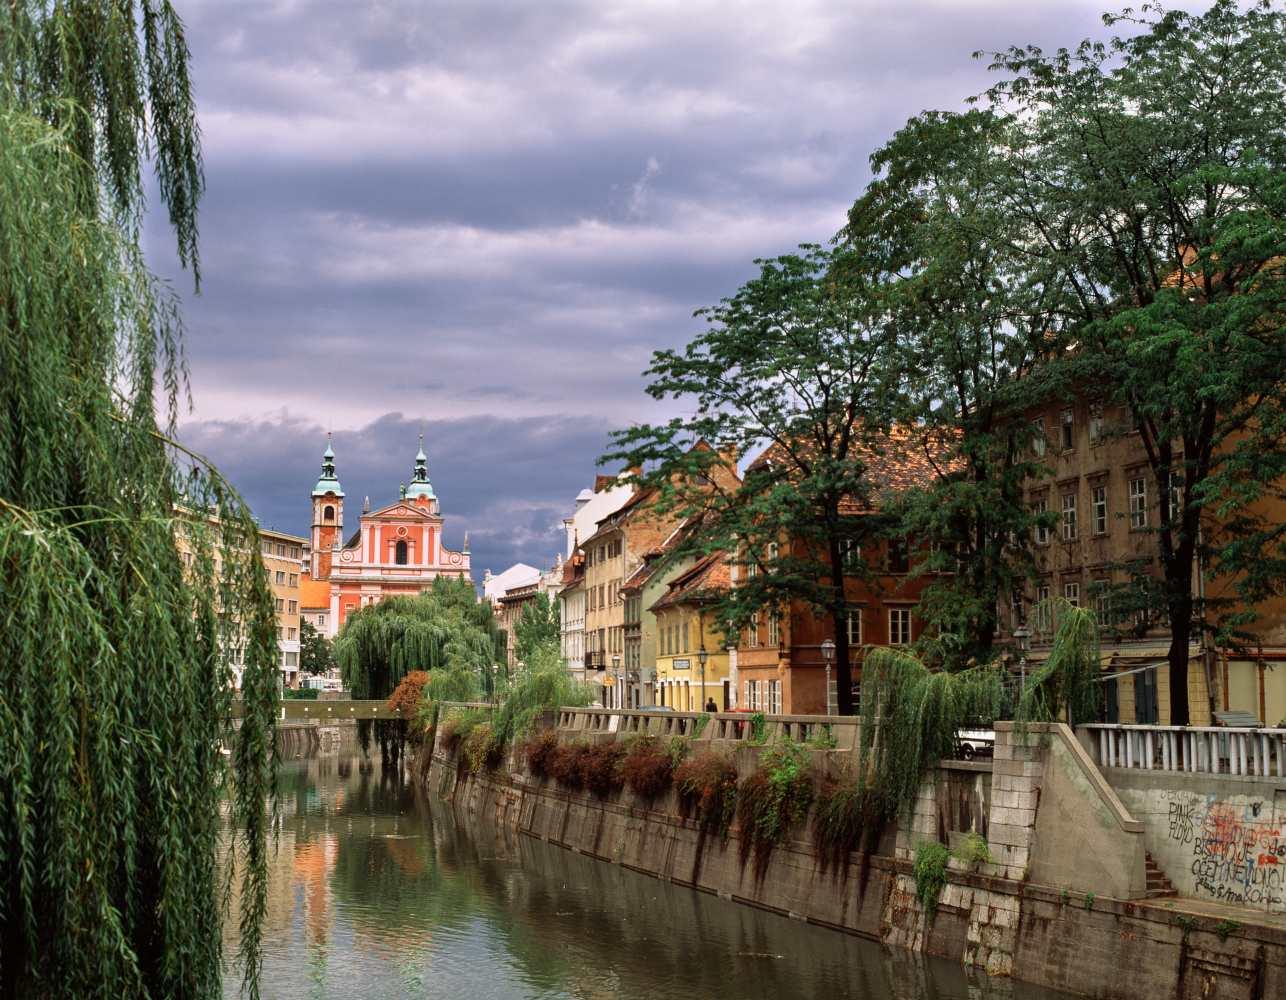 Canal no rio em Ljubljana